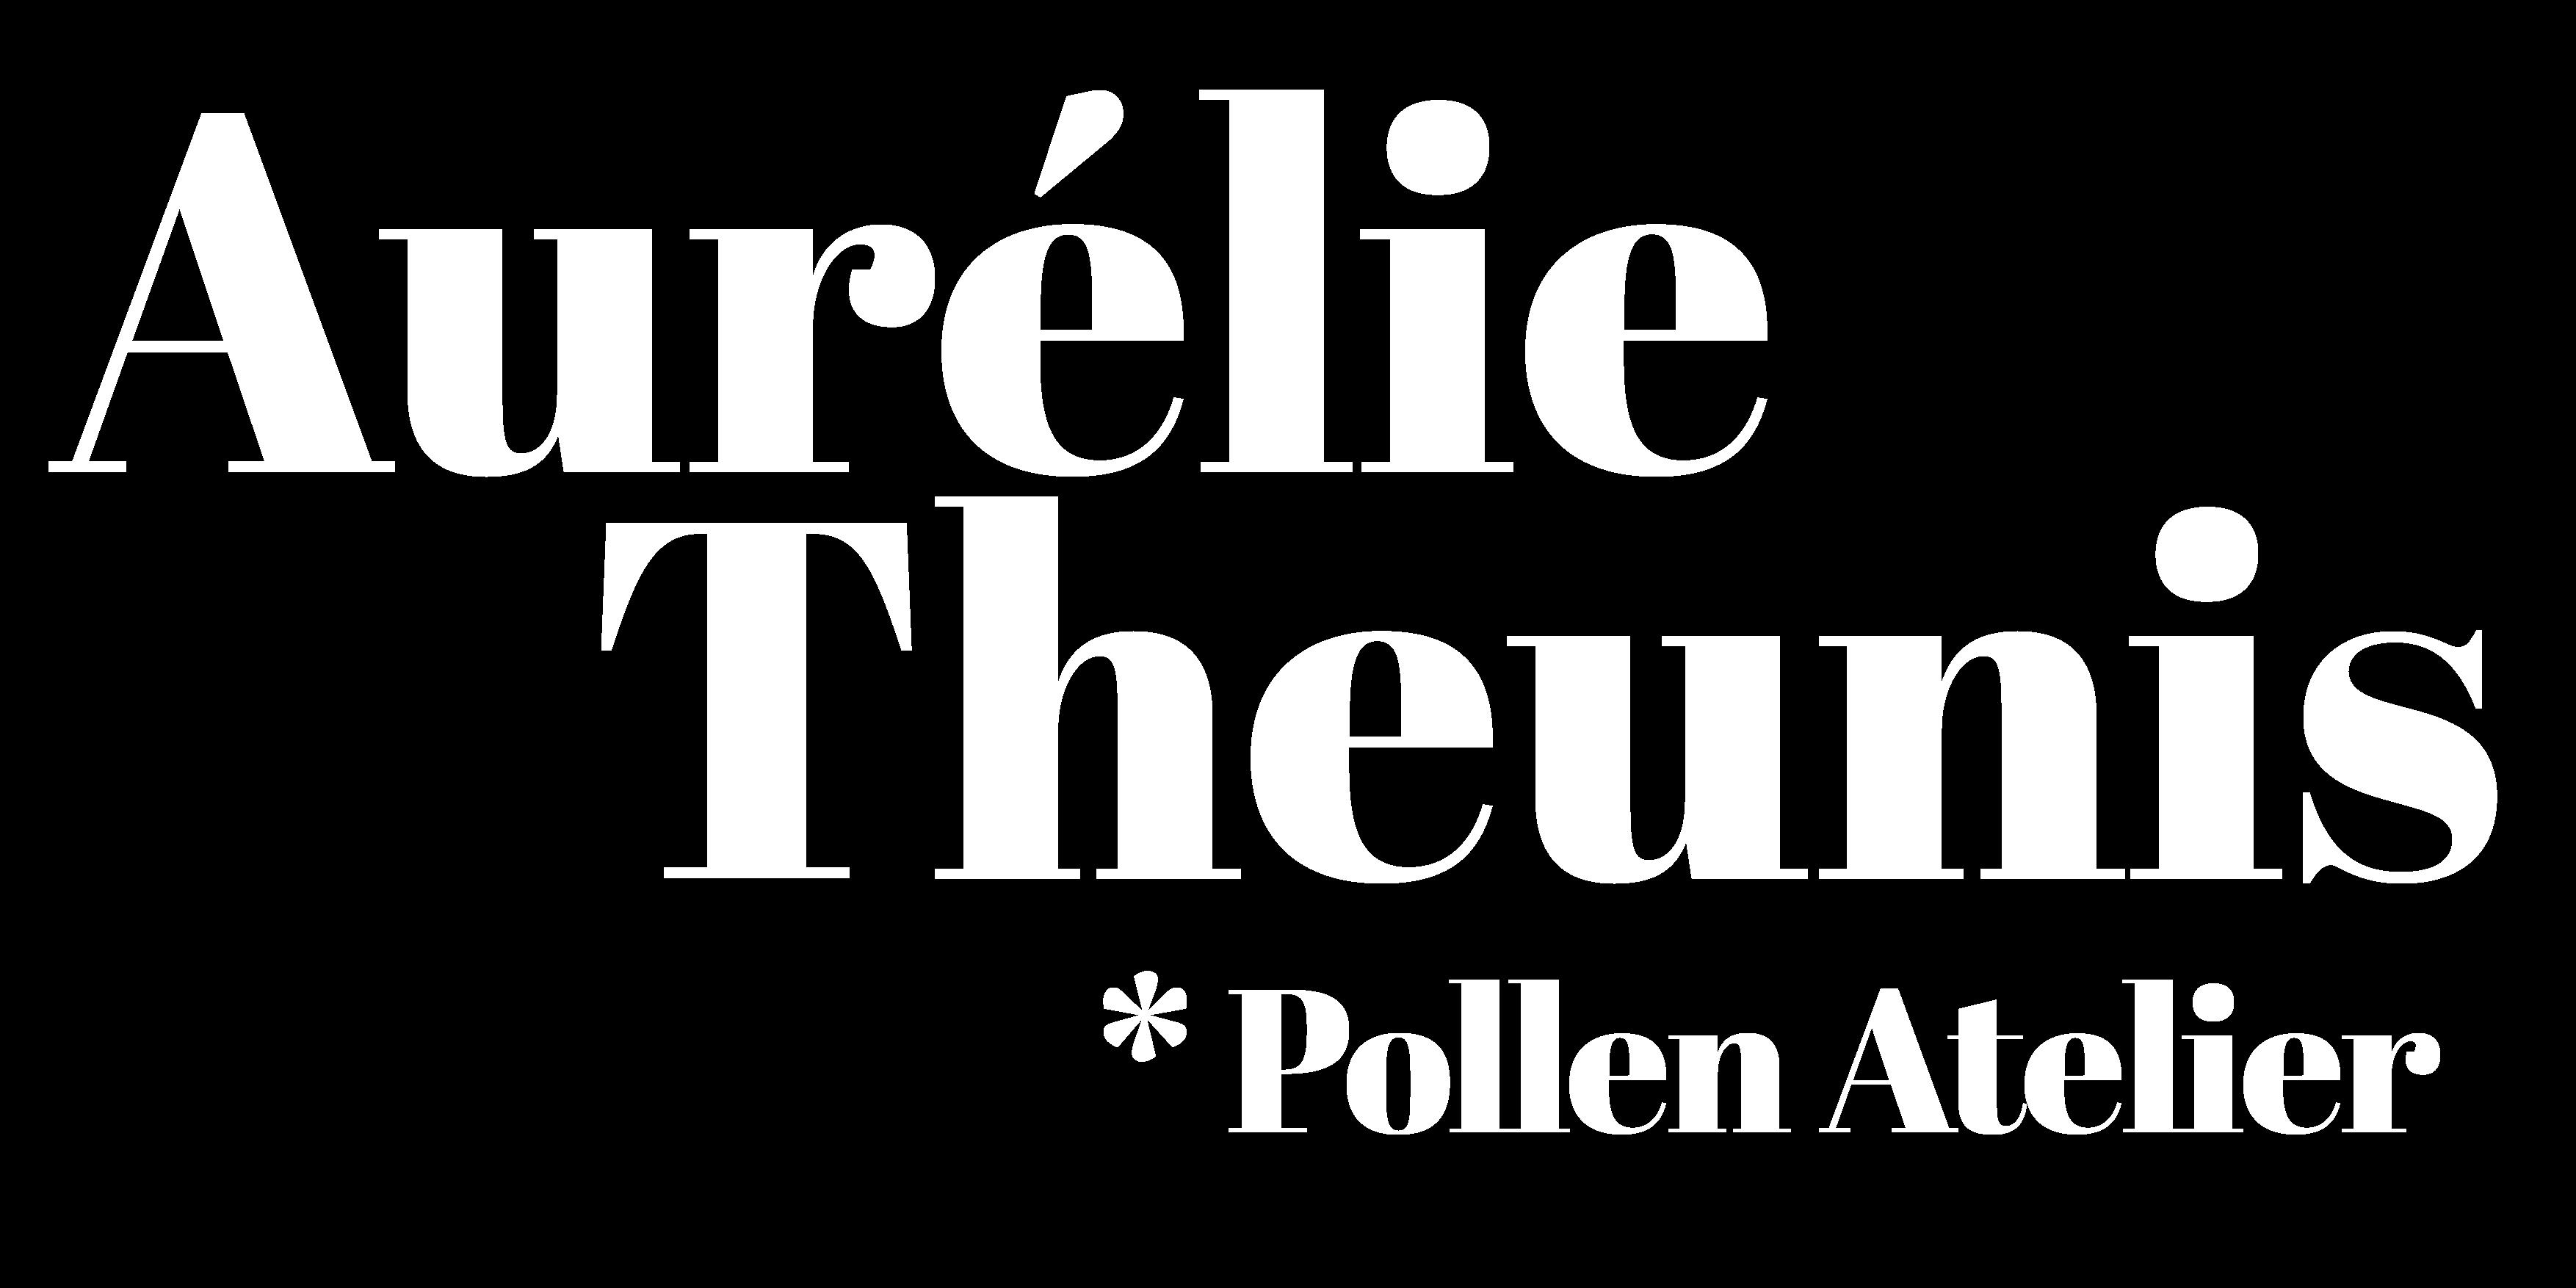 aurélie theunis